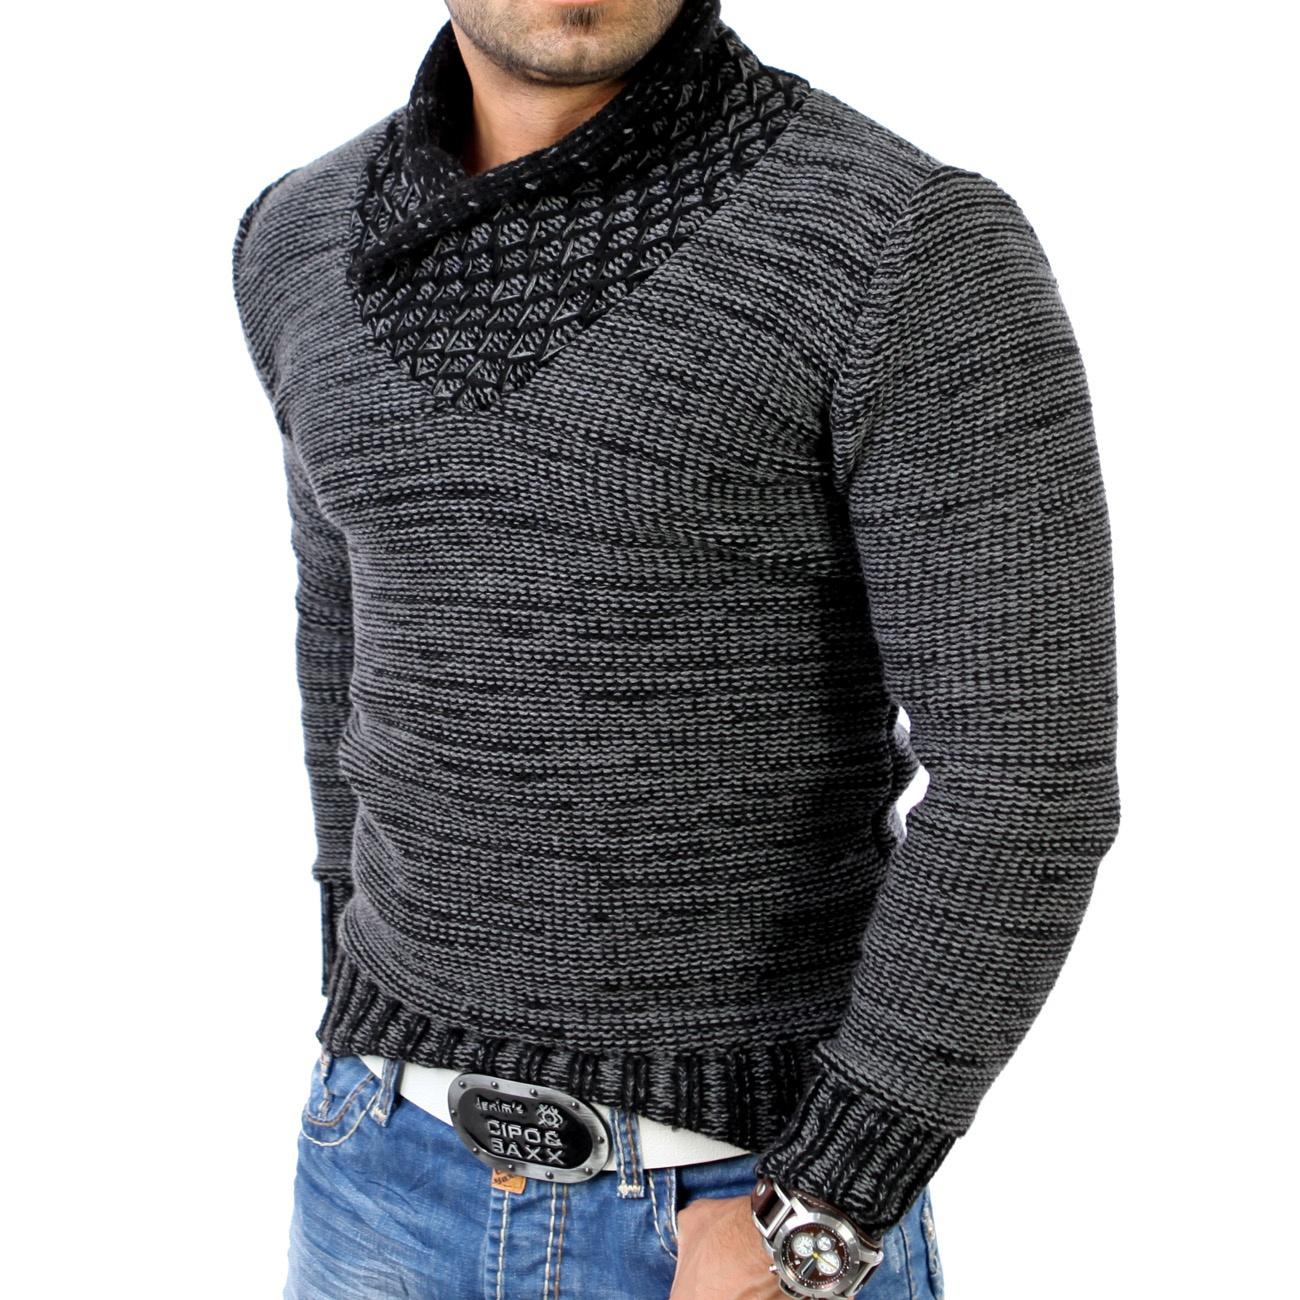 tazzio herren pullover grobstrick sweatshirt strickjacke. Black Bedroom Furniture Sets. Home Design Ideas